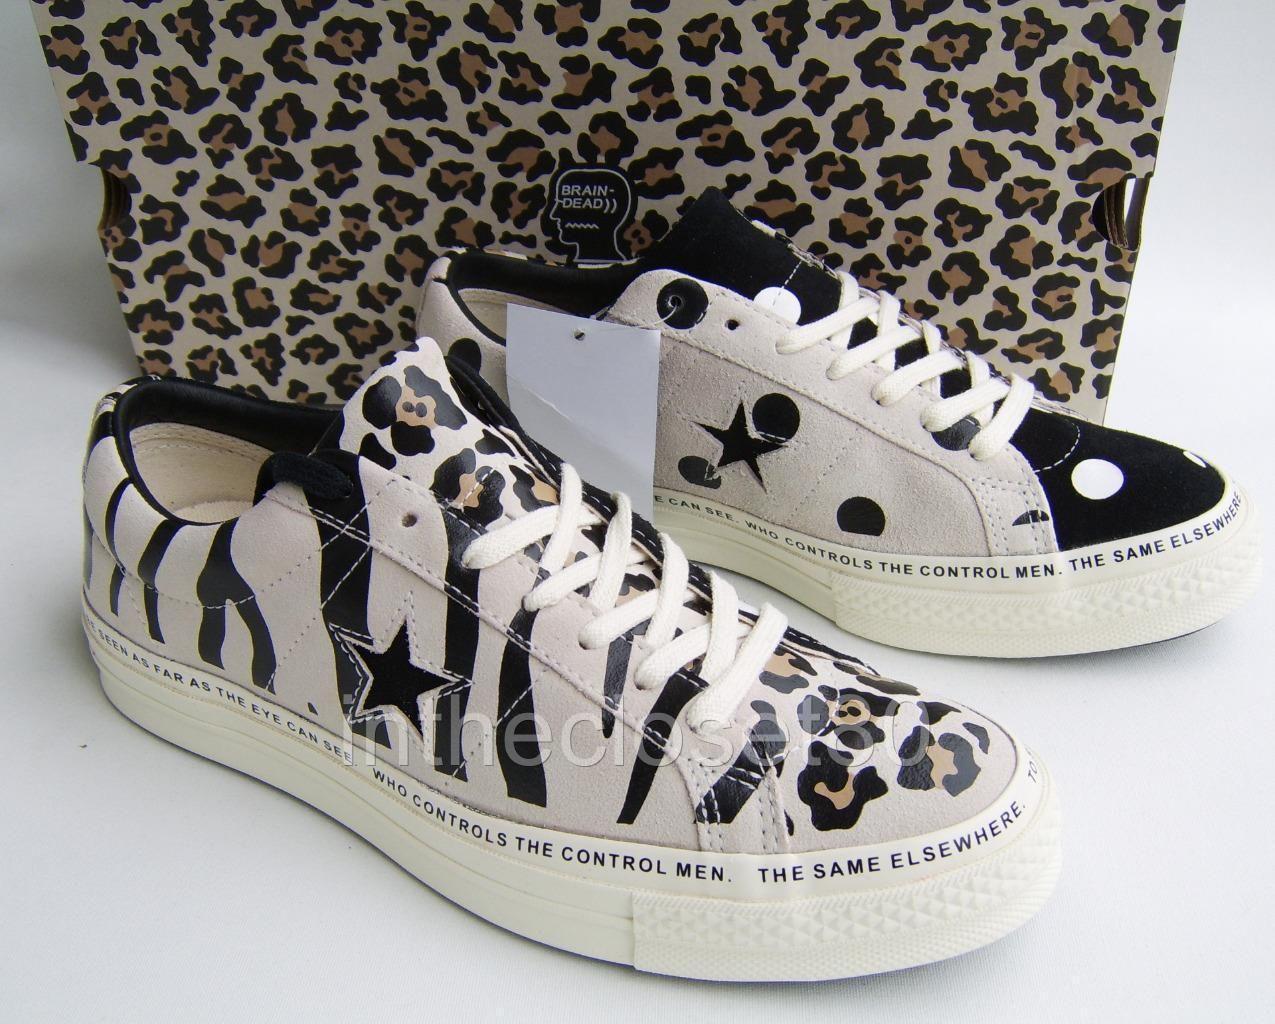 Converse One Star x Brain Dead Zebra Leopard Polka Suede